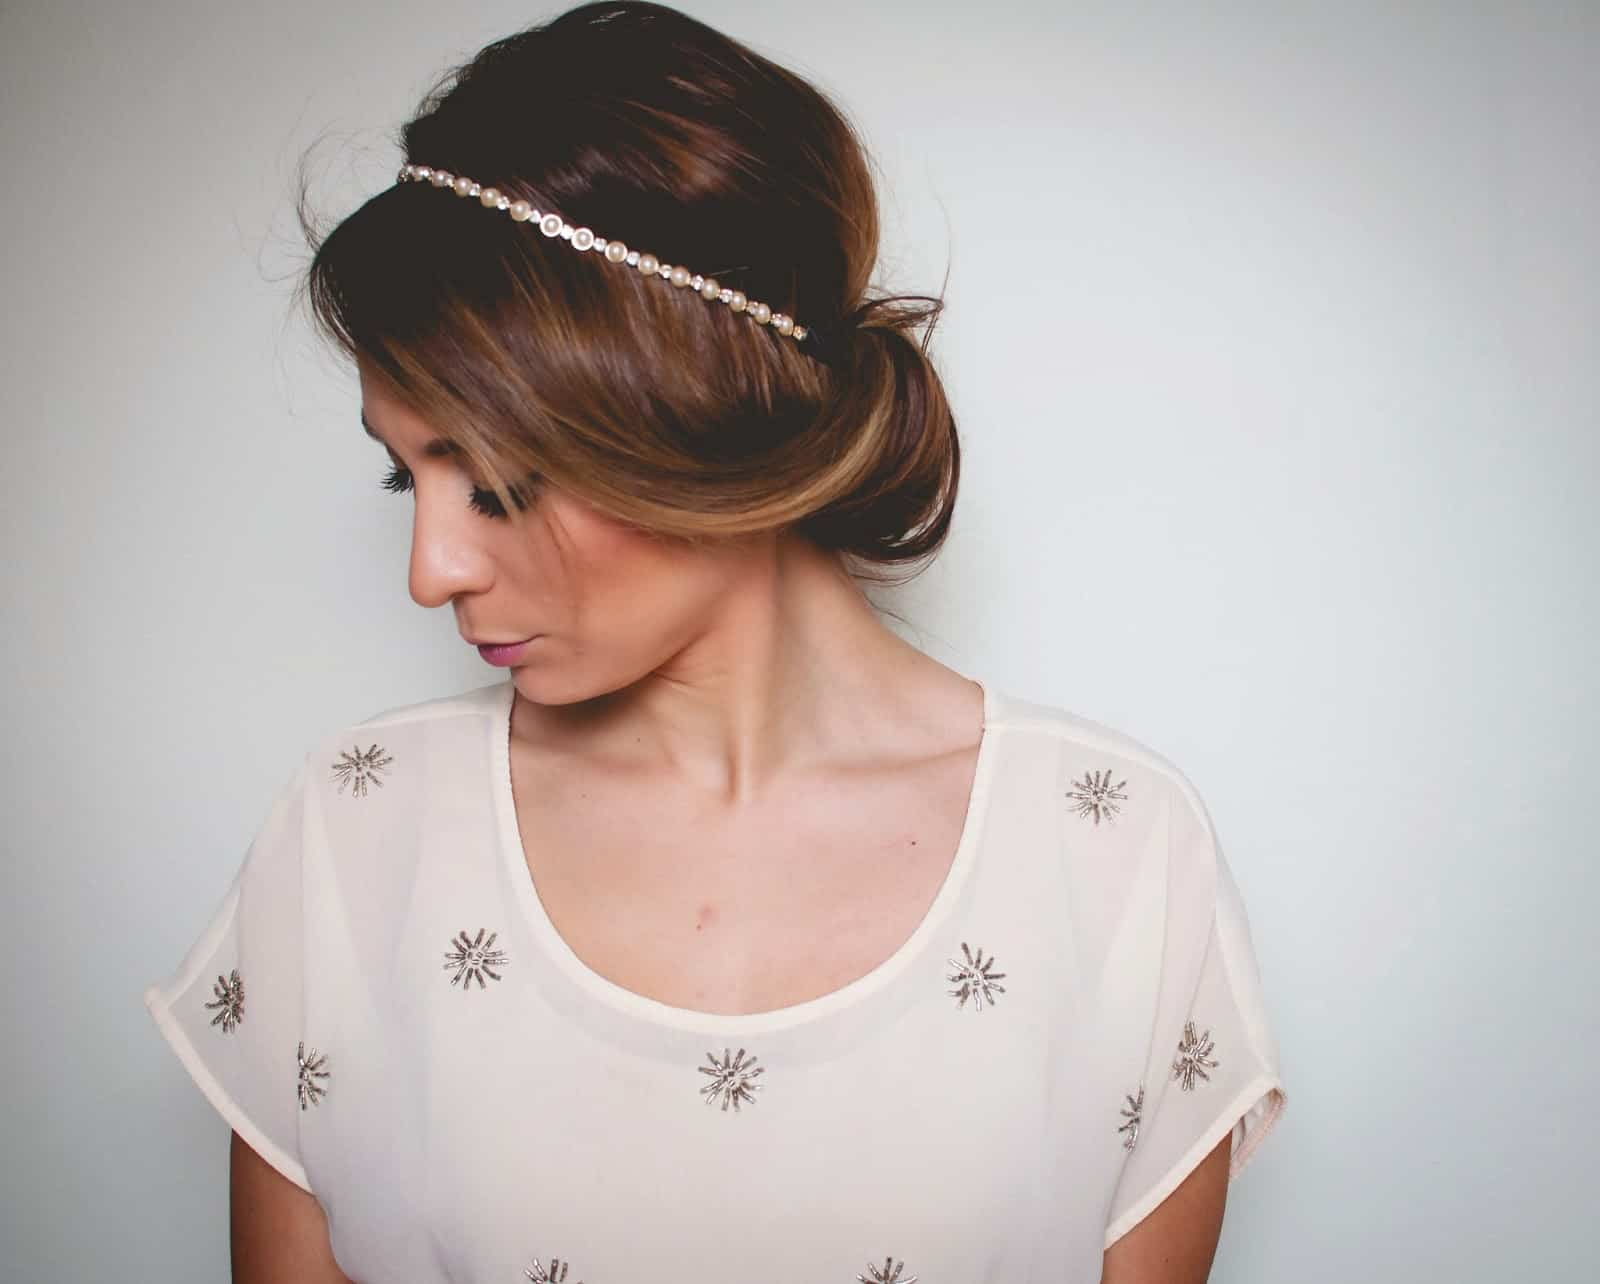 Princess hair wrap tutorial